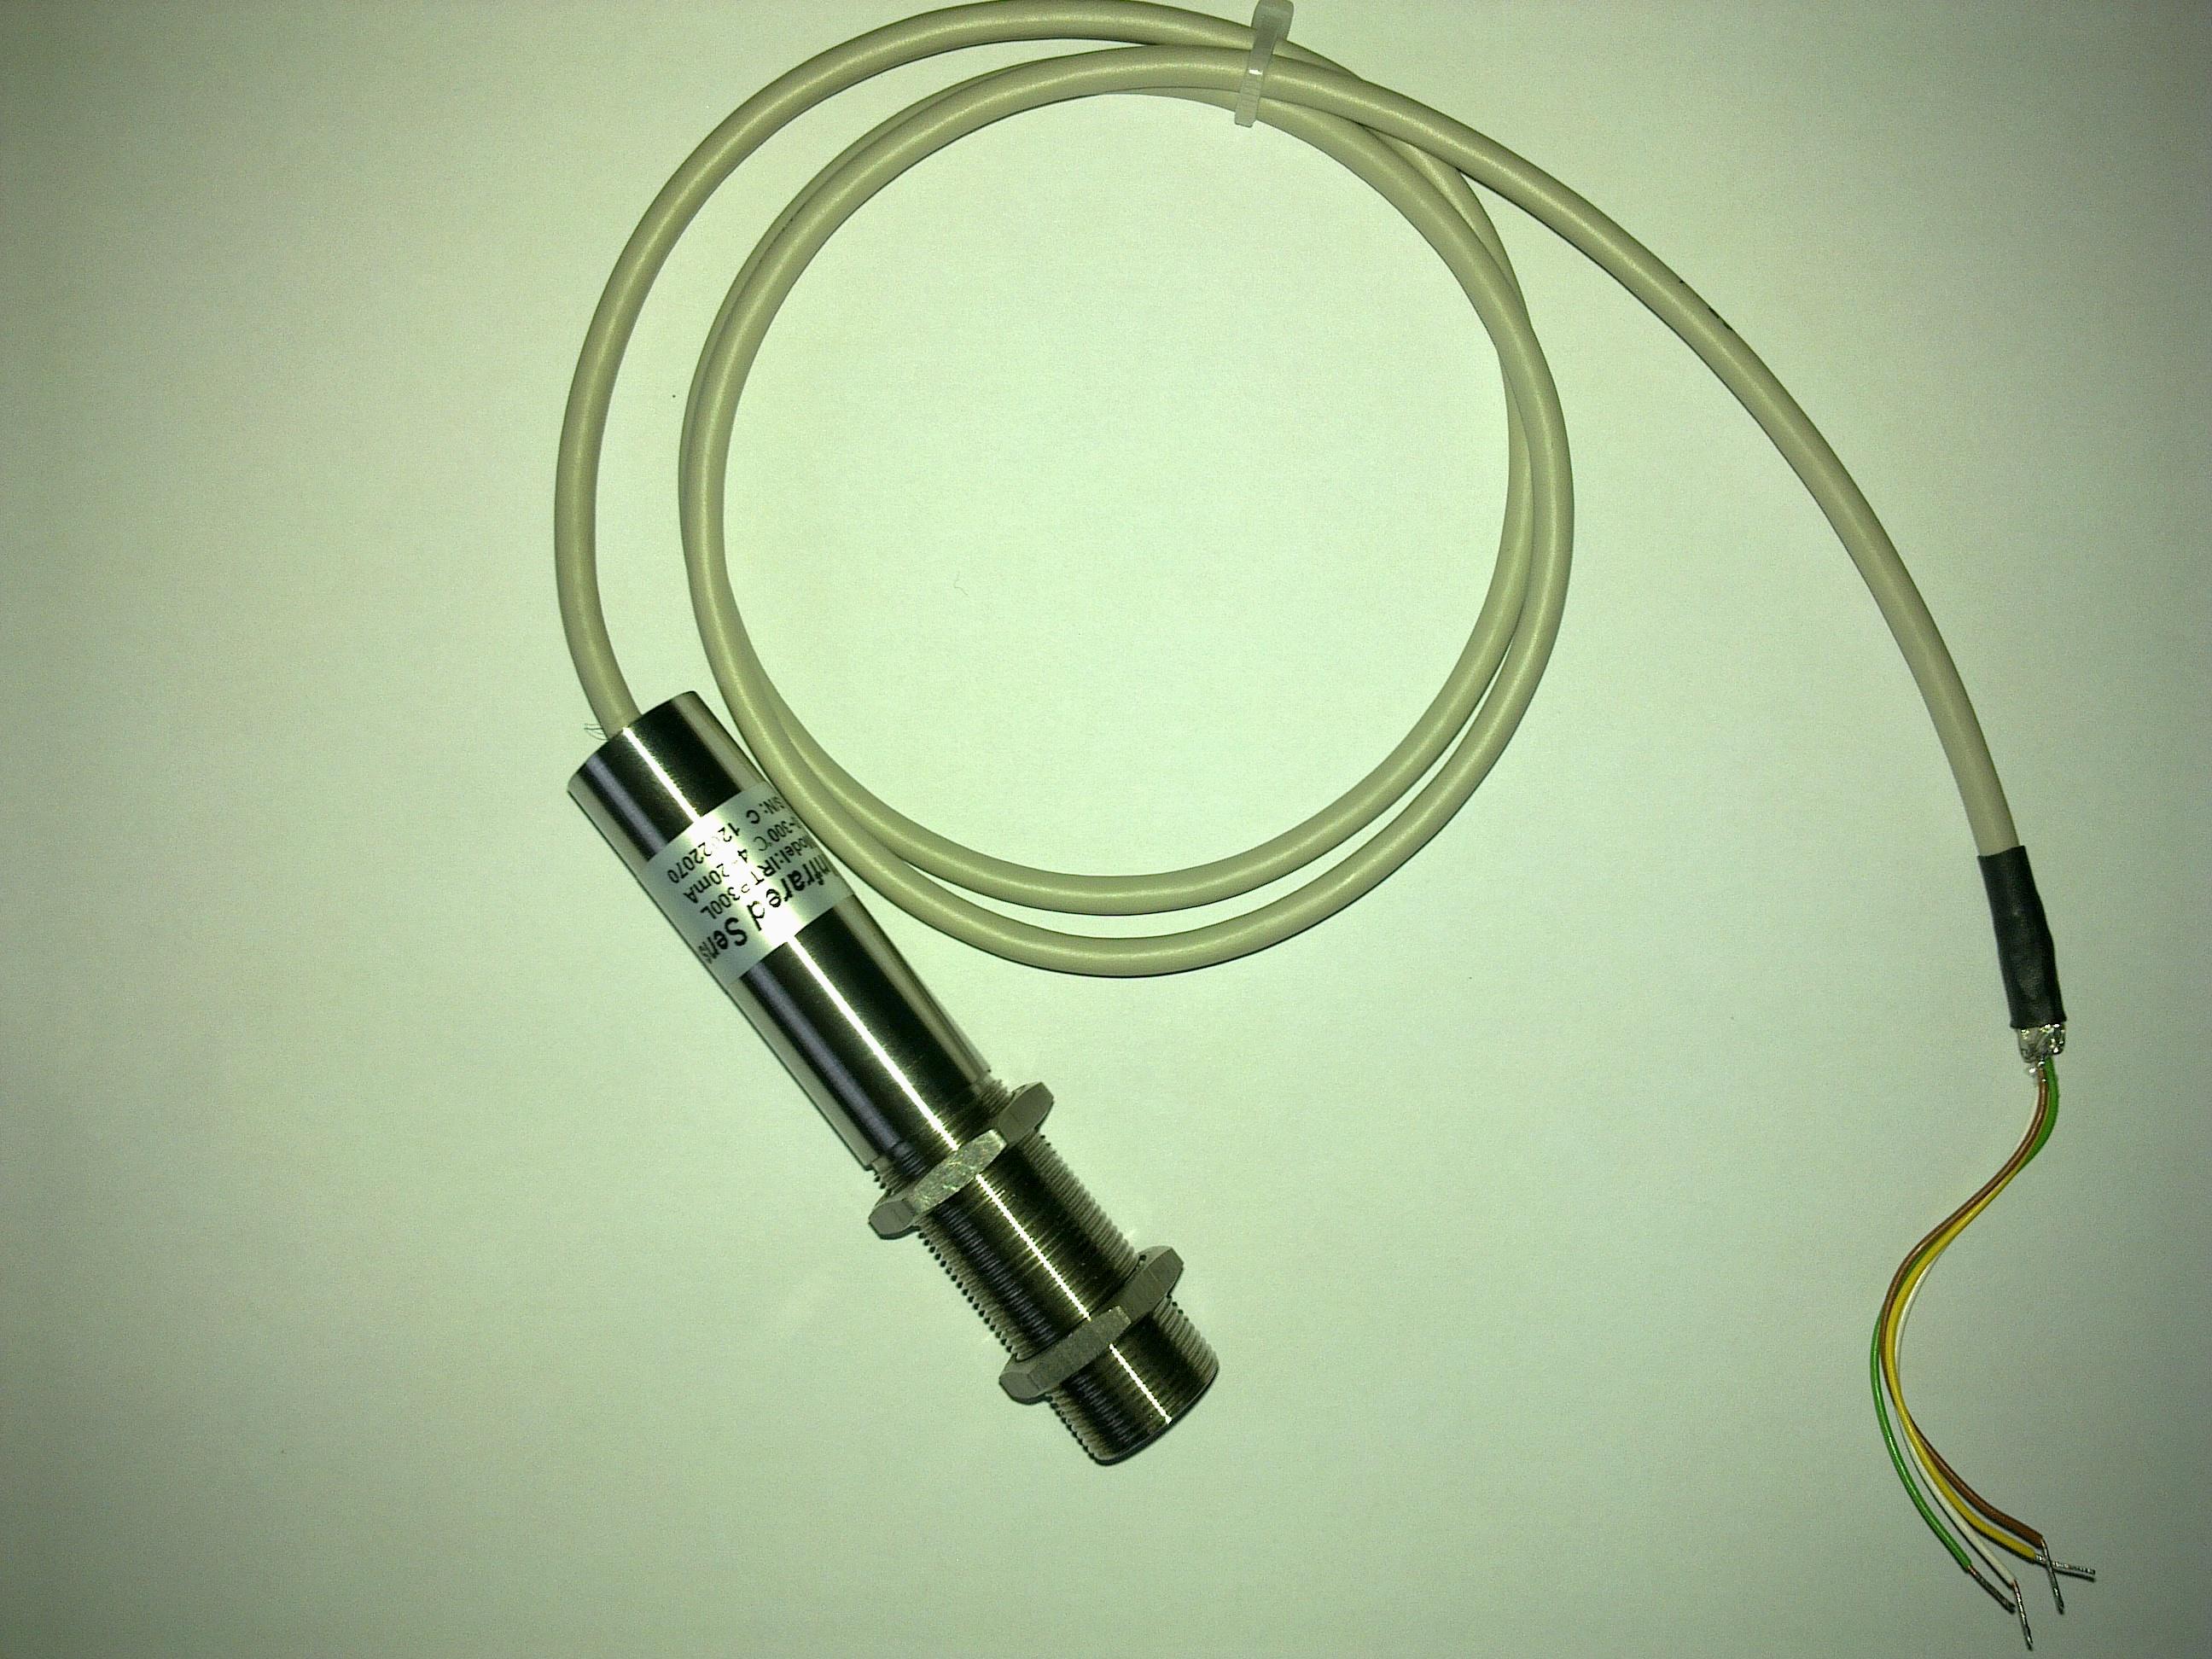 IRTP红外温度传感器介绍: IRTP300系列是一种集信号处理电路以及环境温度补偿电路的多用途经济型红外测温探头,完全由工厂进行校准,这使它成为多用途,紧凑的,高精度红外测温头。它是一种高效的,不受环境影响的器测温头,例如污染,潮湿以及电磁干扰环境等。 应用领域:非接触温度传感器,手持式或者工业测温仪;轴承温度测量;电气设备:电缆接头、开关柜、变压器和电气面板的故障监测等;汽车、微波炉,空调、燃气灶具等产品。 IRTP红外温度传感器参数: 1.